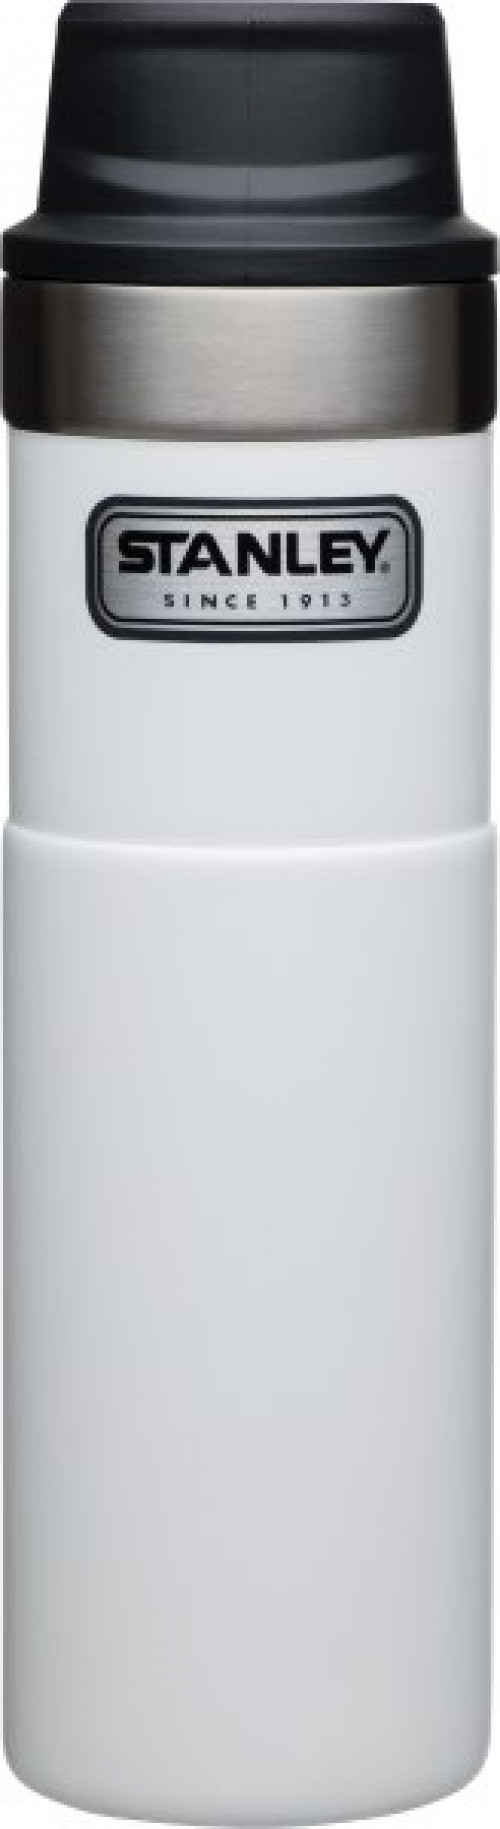 Stanley Termokopp Classic Onehand 2.0 Polar White 354 ml